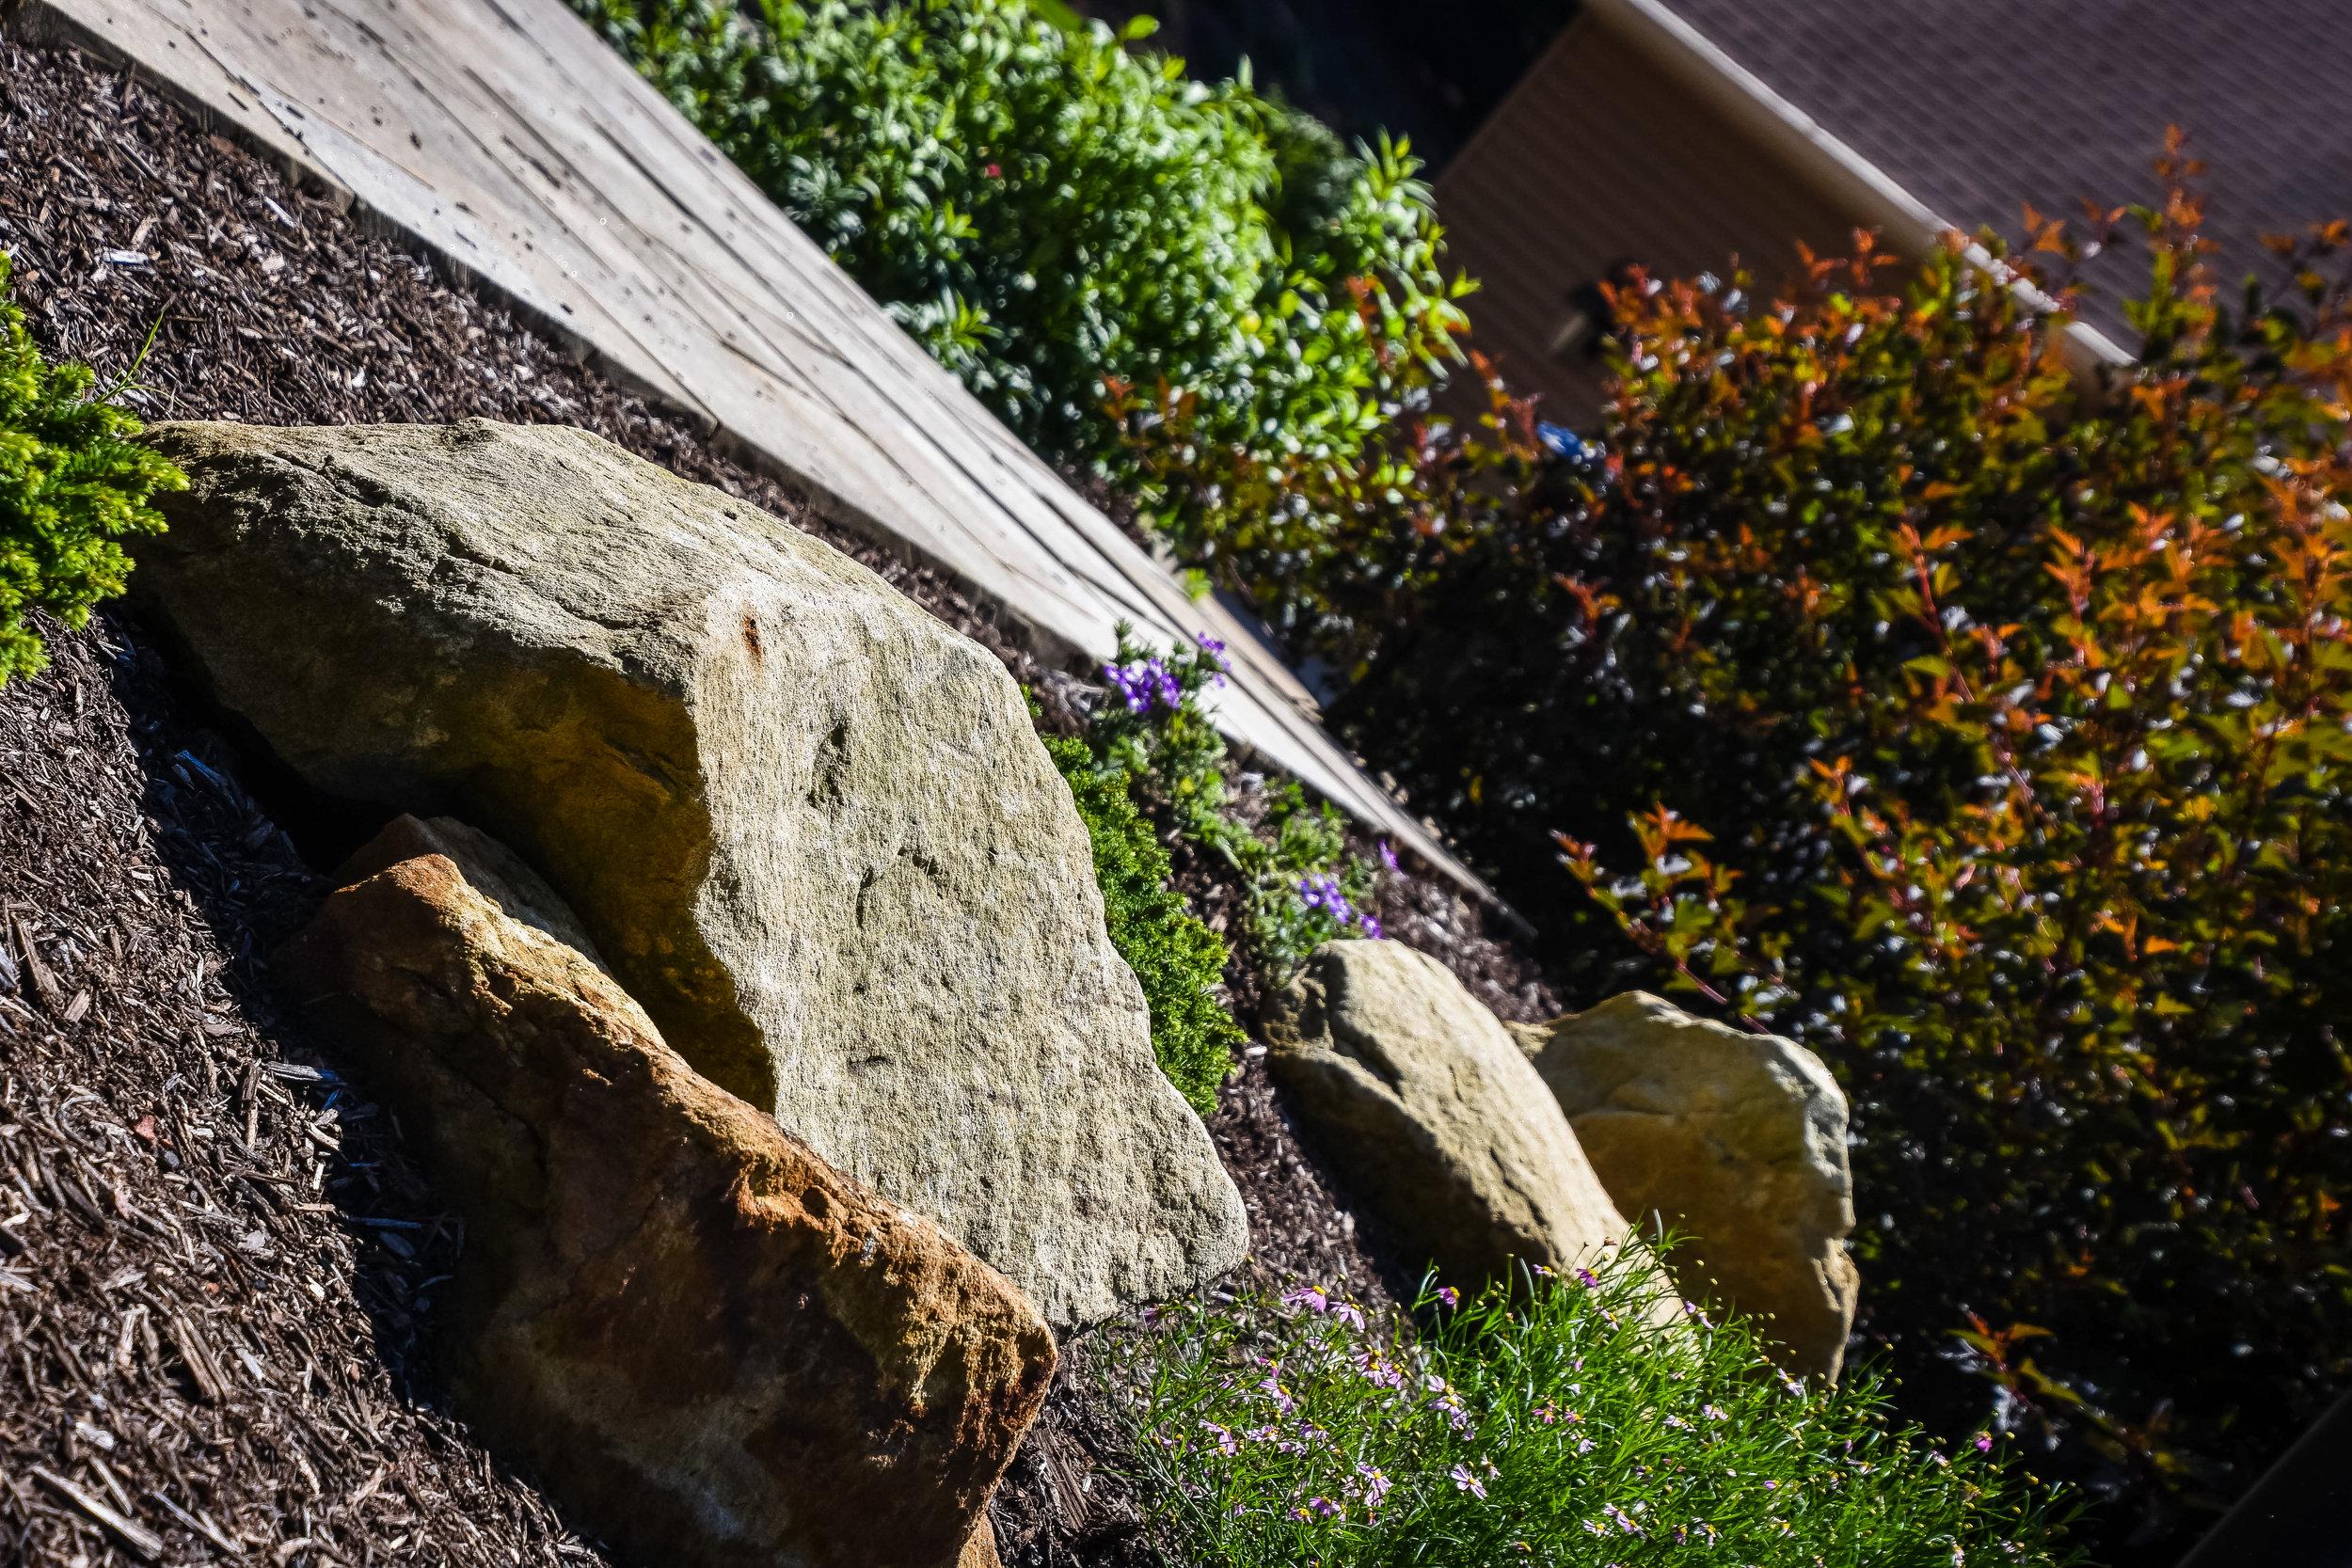 Buckeye_Landscaping63.jpg